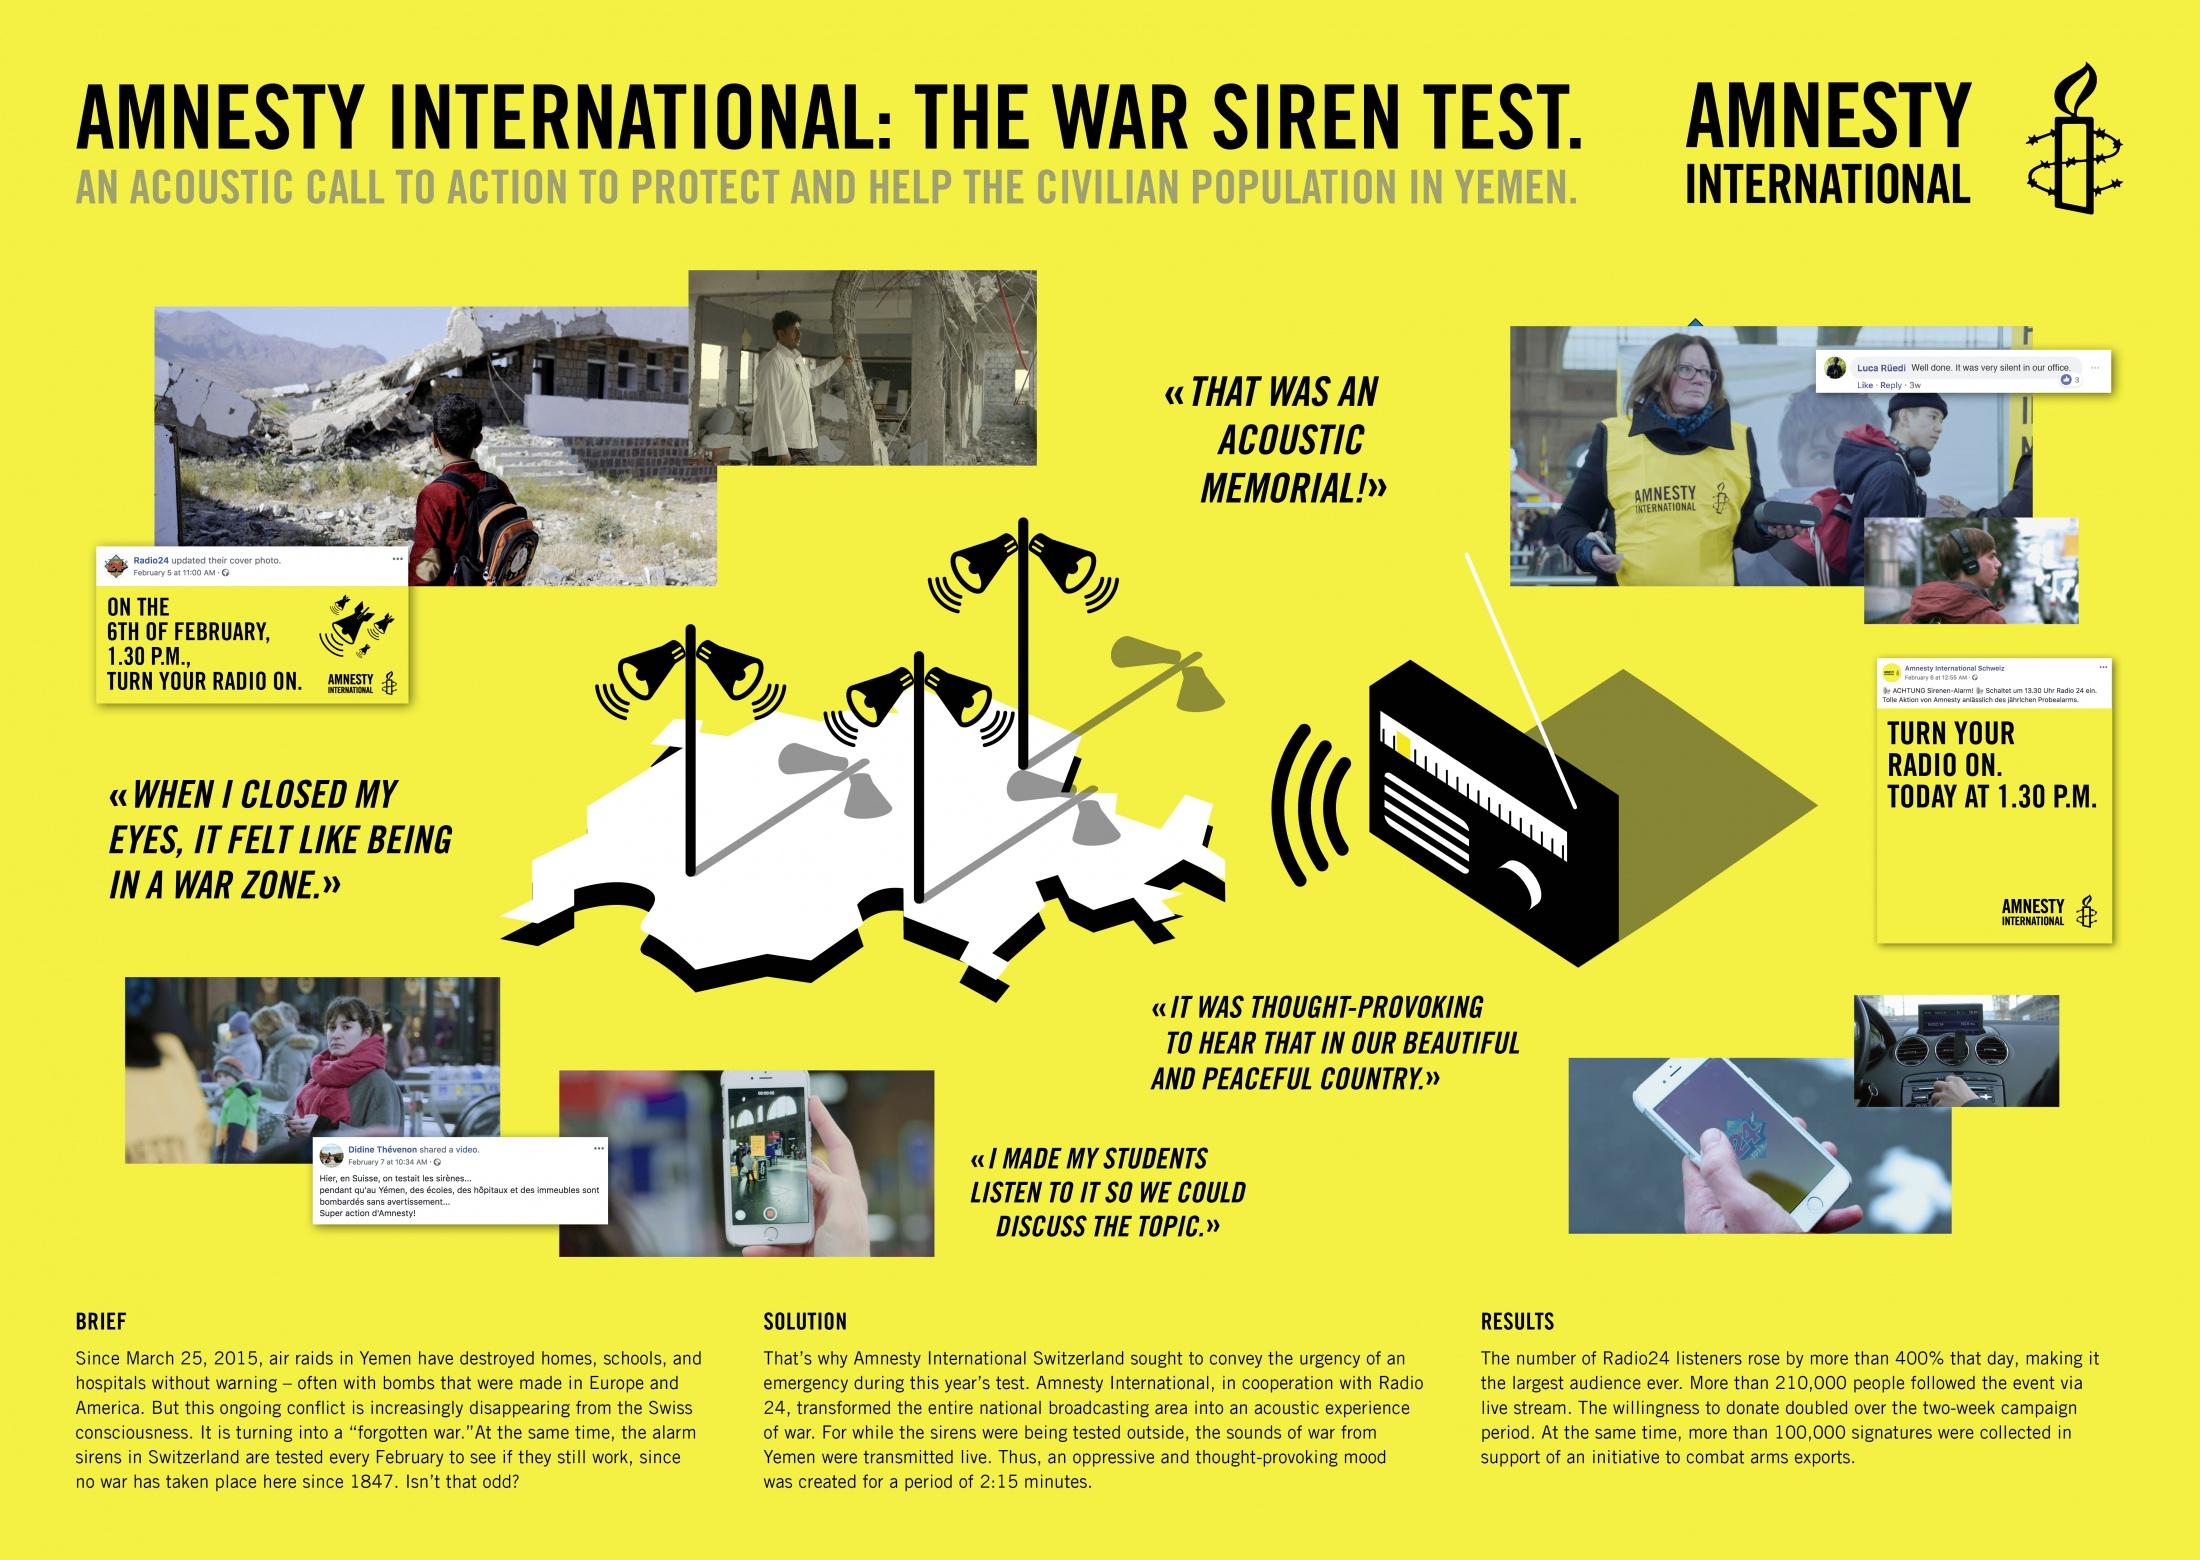 Thumbnail for The War Siren Test